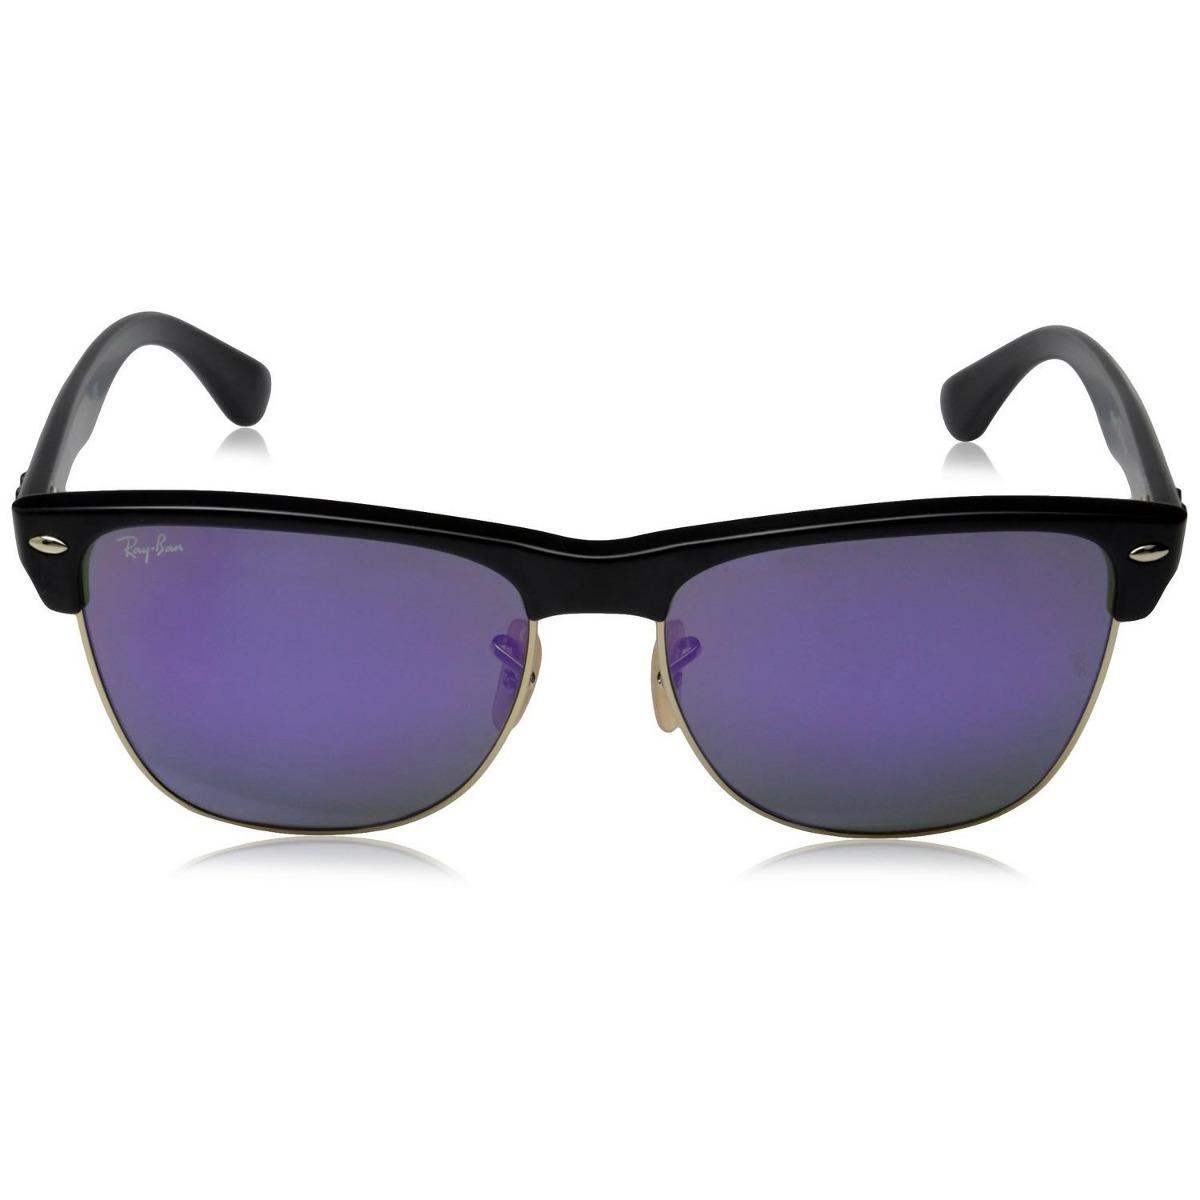 a493817419 ray ban clubmaster oversized rb 4175 877/1m violeta espejo. Cargando zoom.